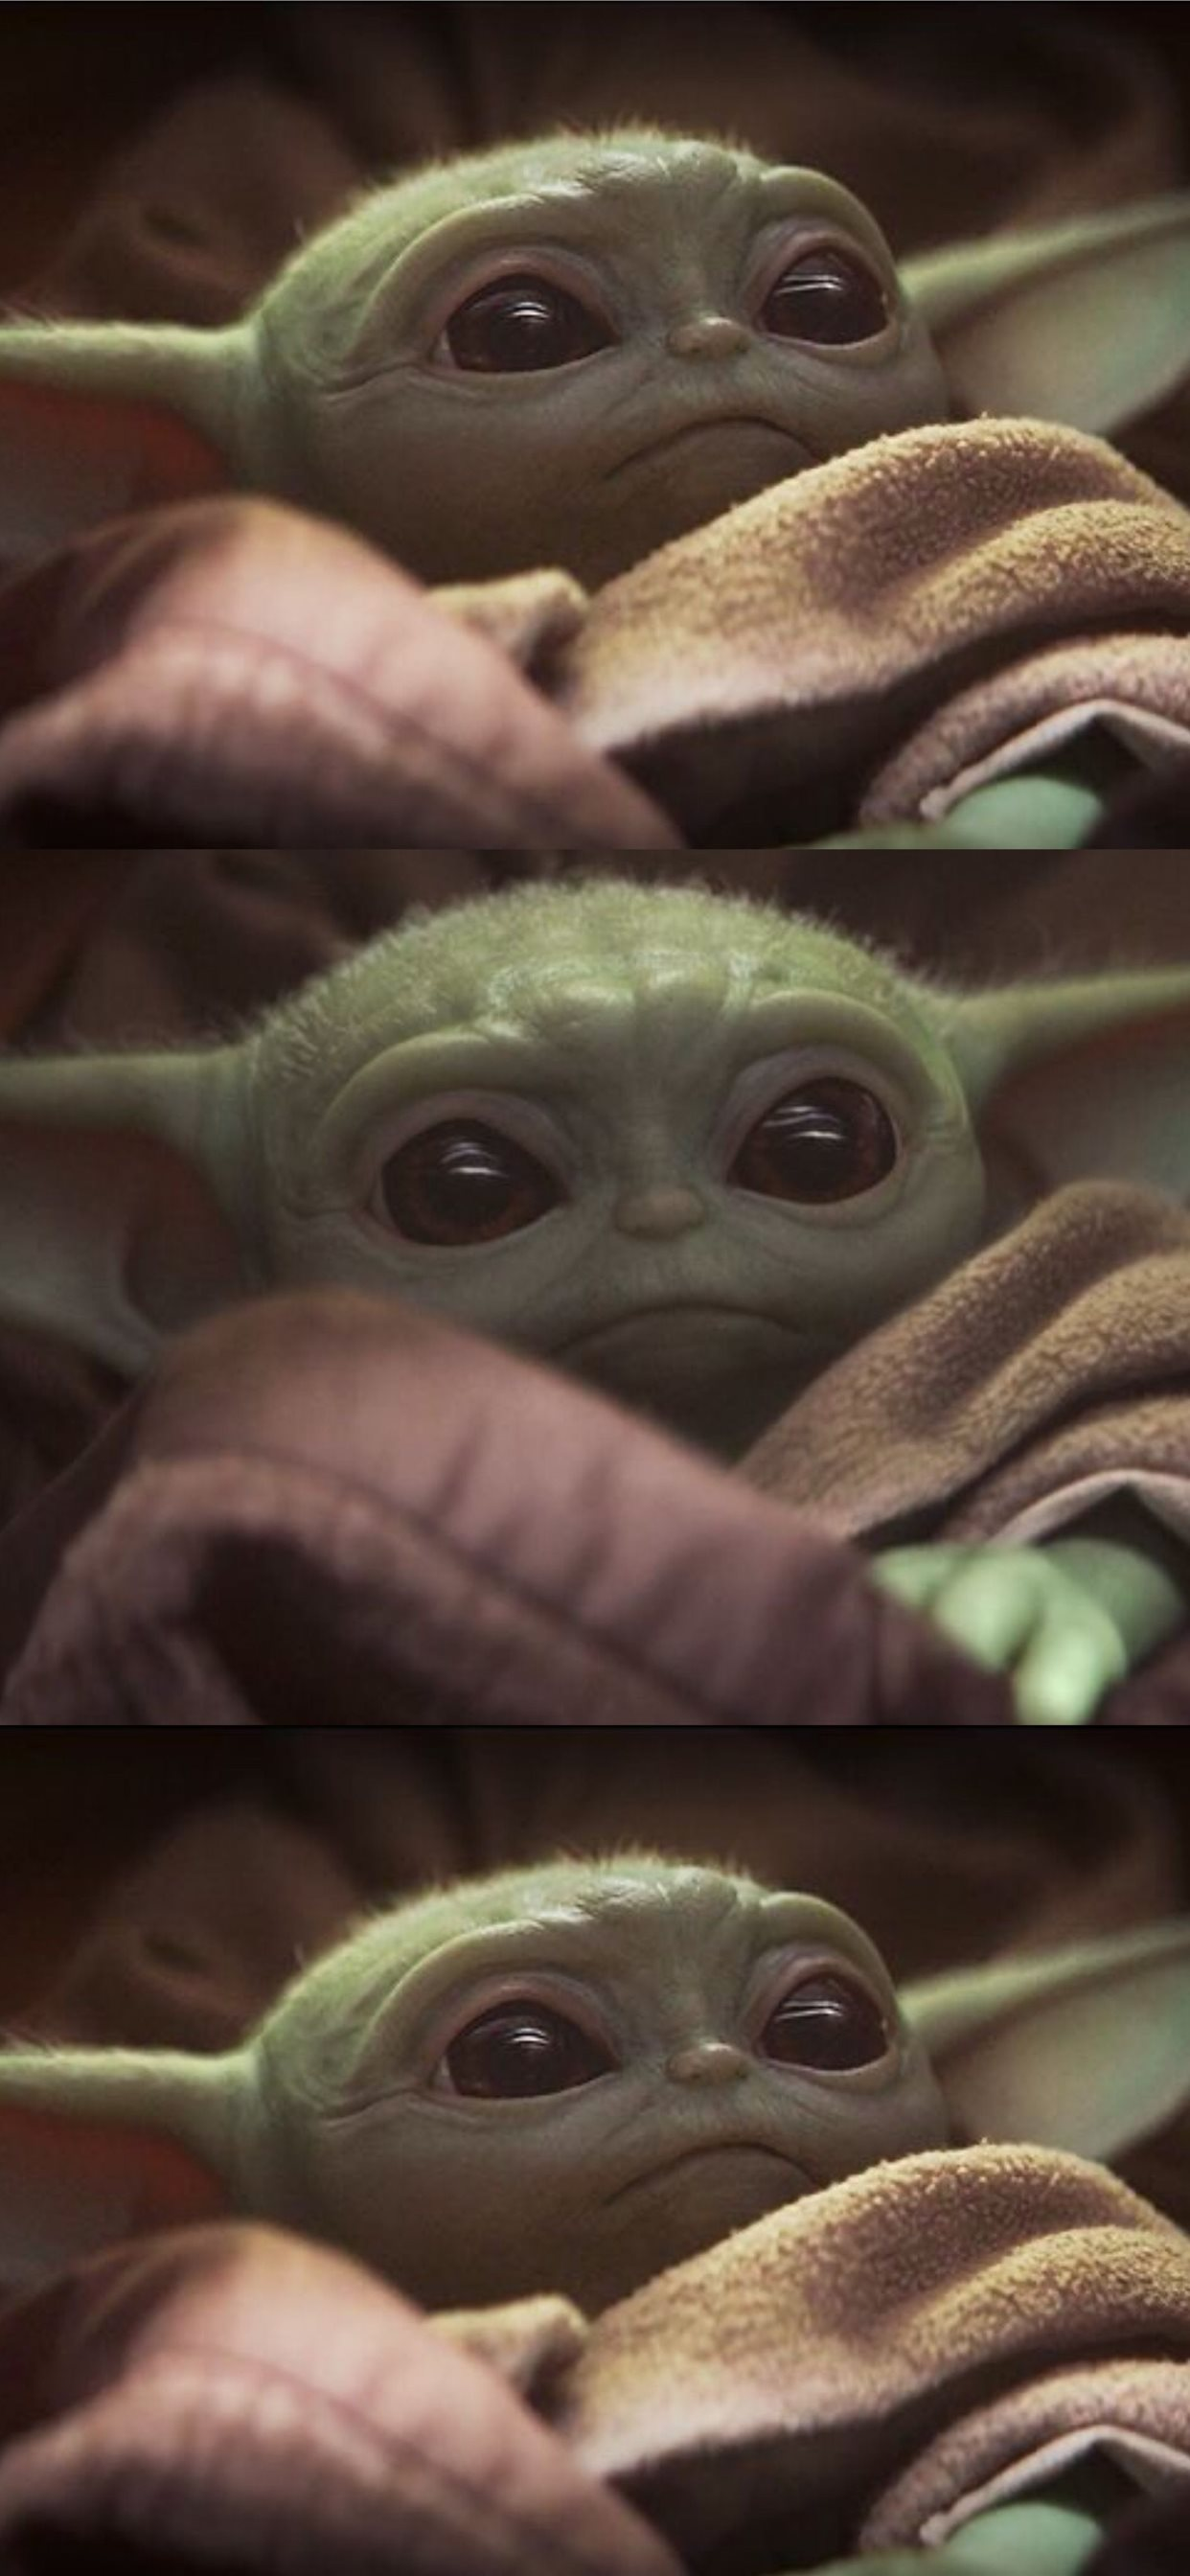 Cute Baby Yoda Mandalorian 4k Star Wars Disney Iphone X Wallpapers Free Download